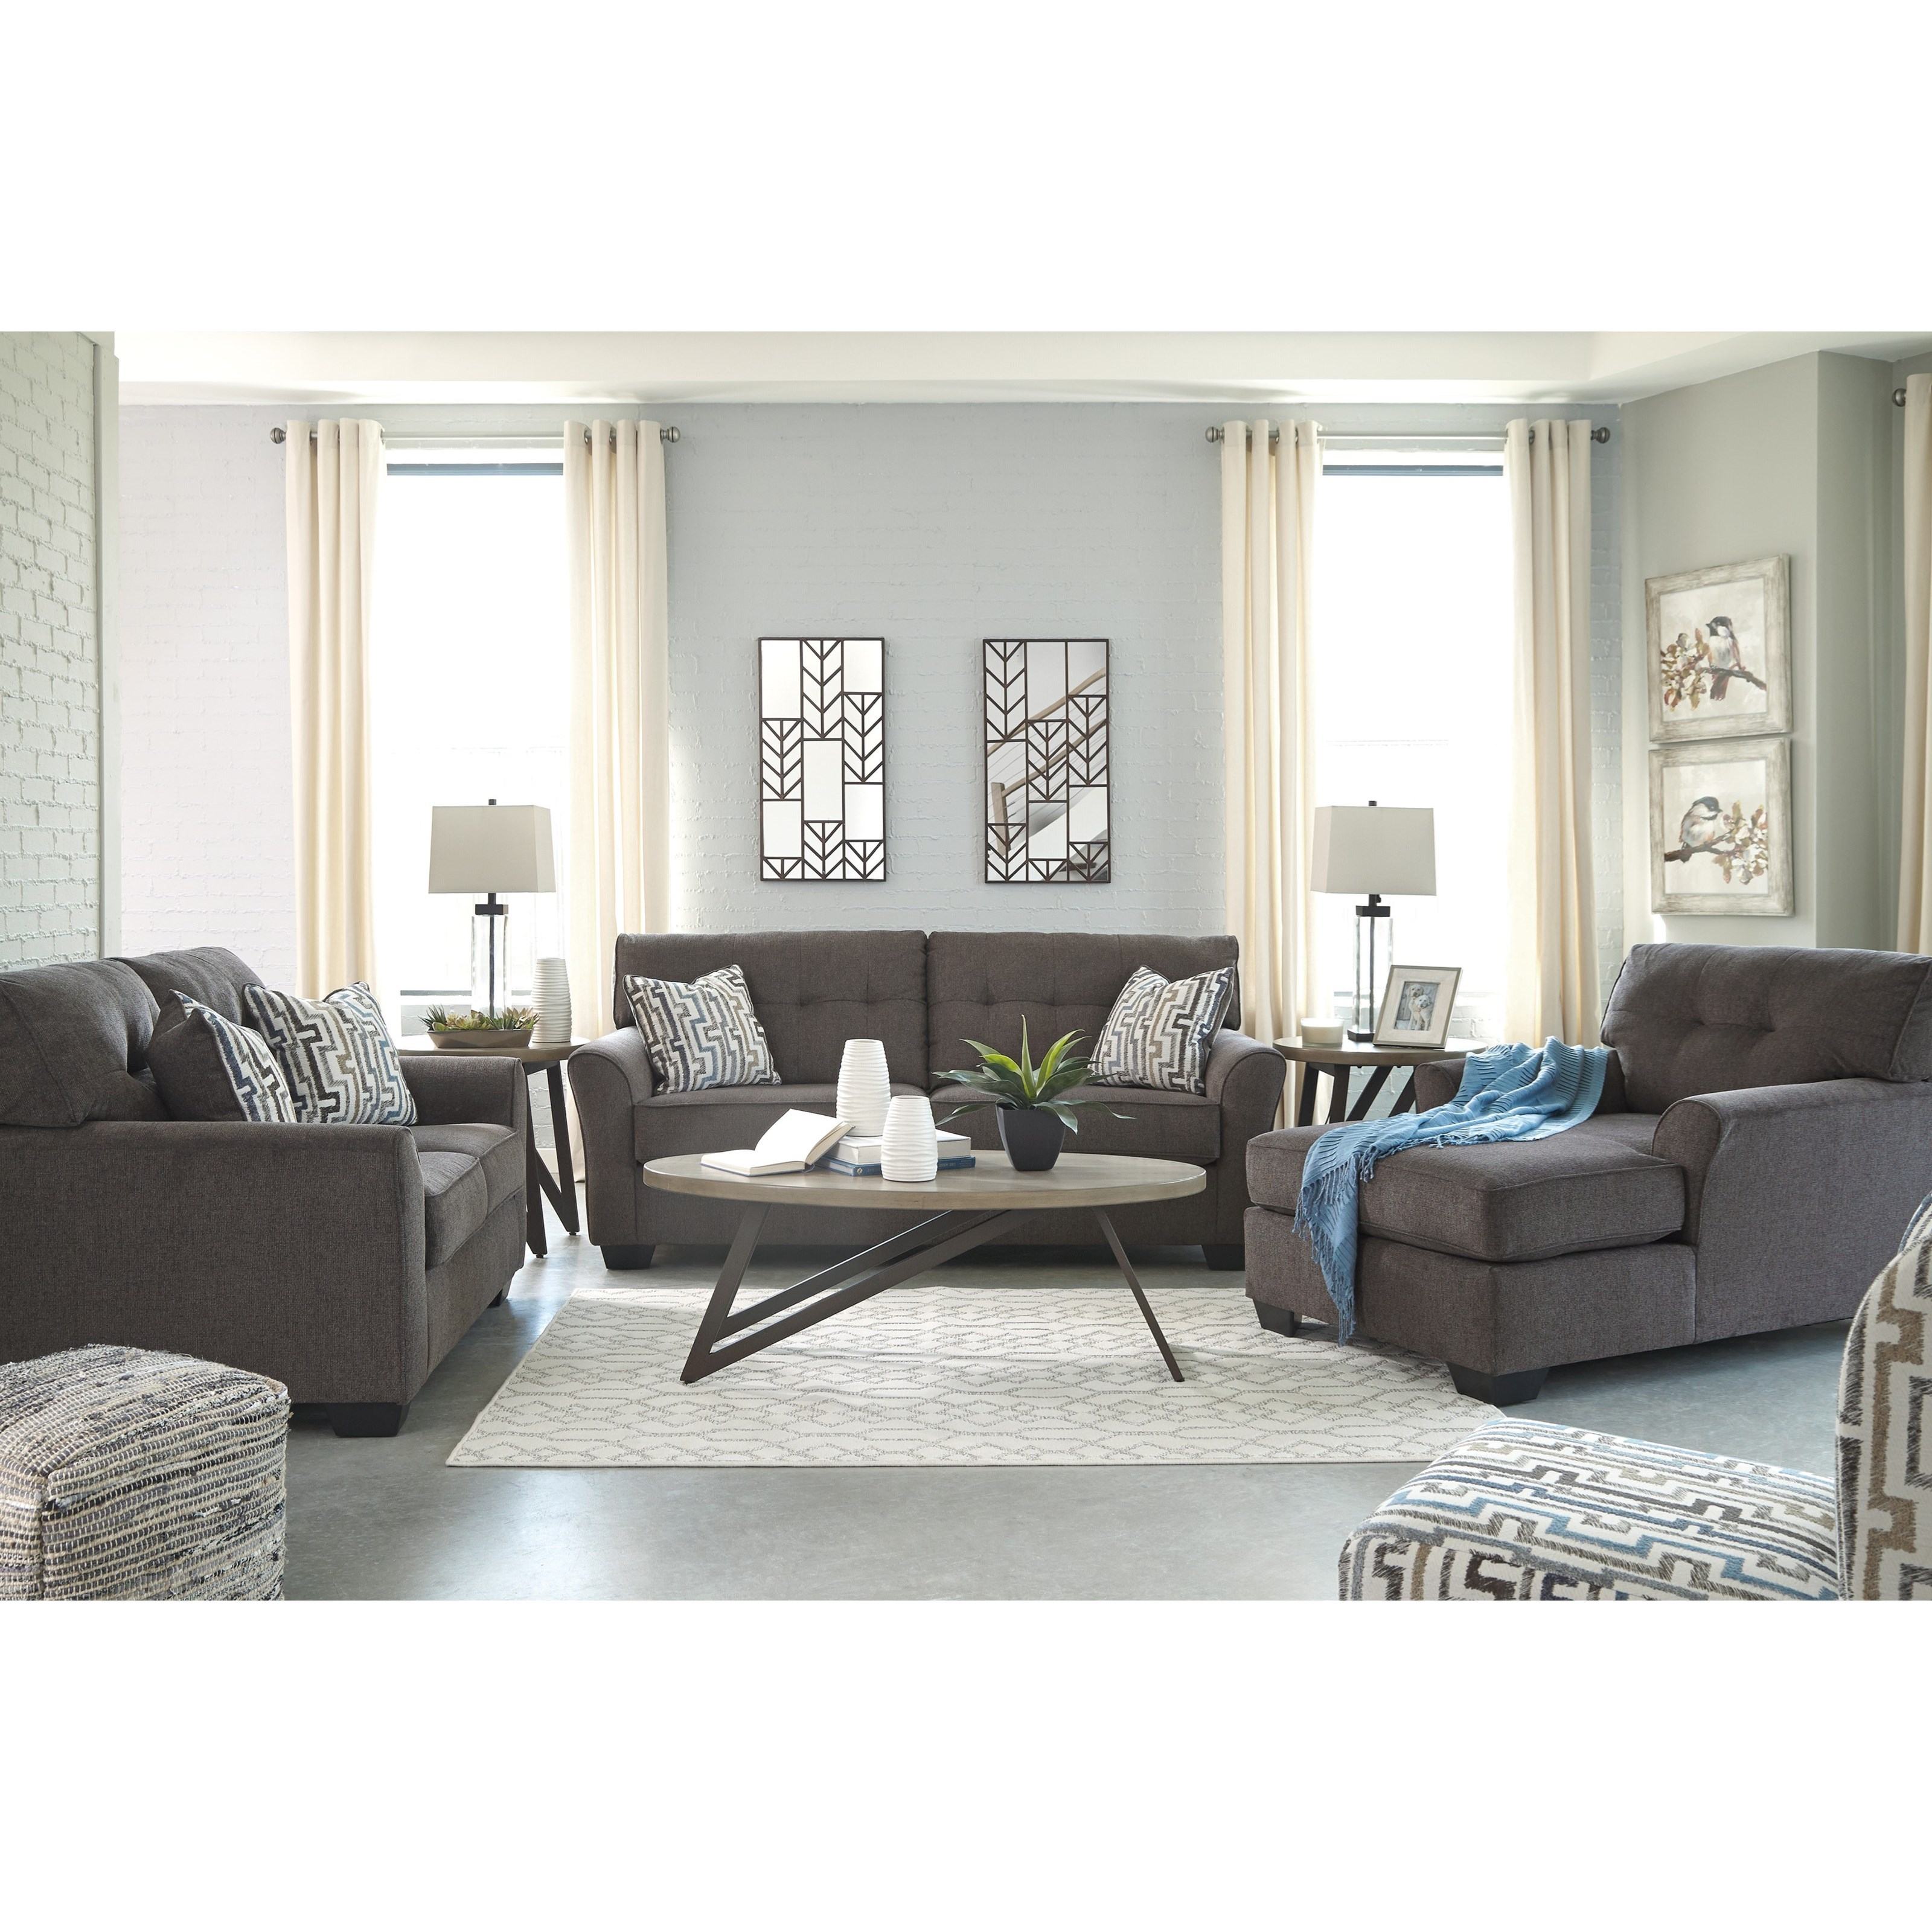 Living Room Furniture Nj: Benchcraft Alsen Contemporary Full Sofa Sleeper With